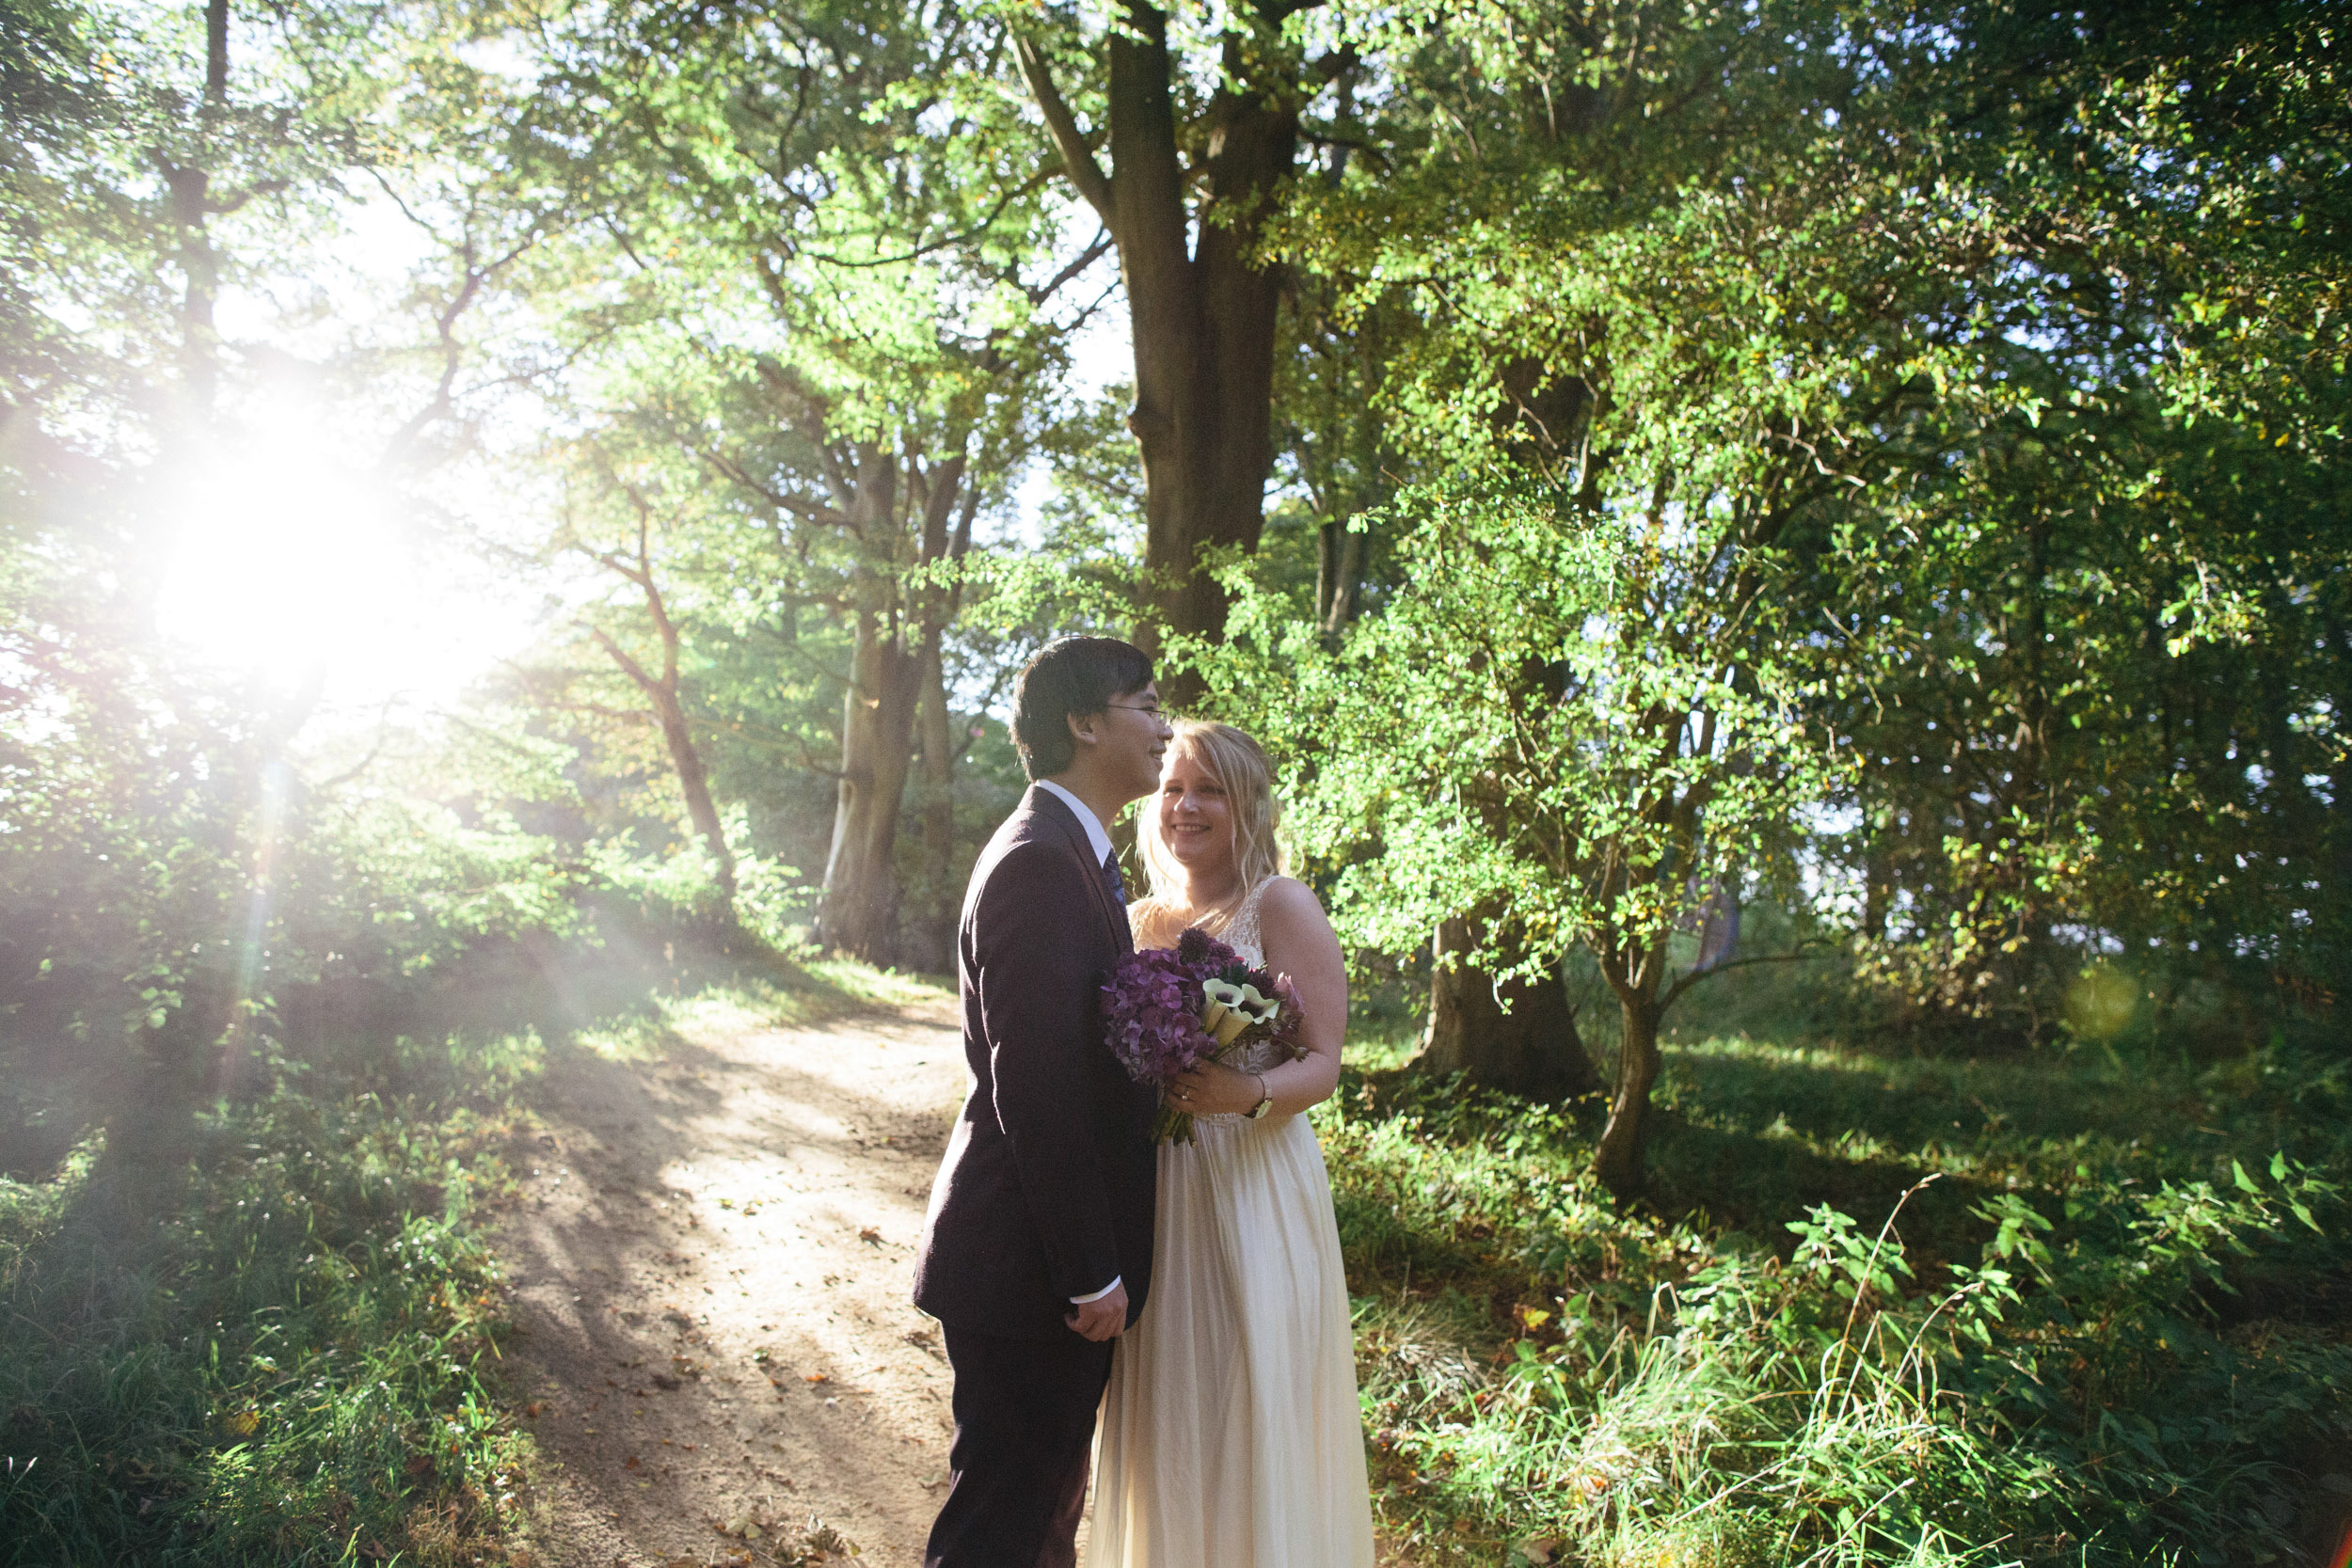 Quirky Wedding Photographer Edinburgh Jupiter Artland -38.jpg